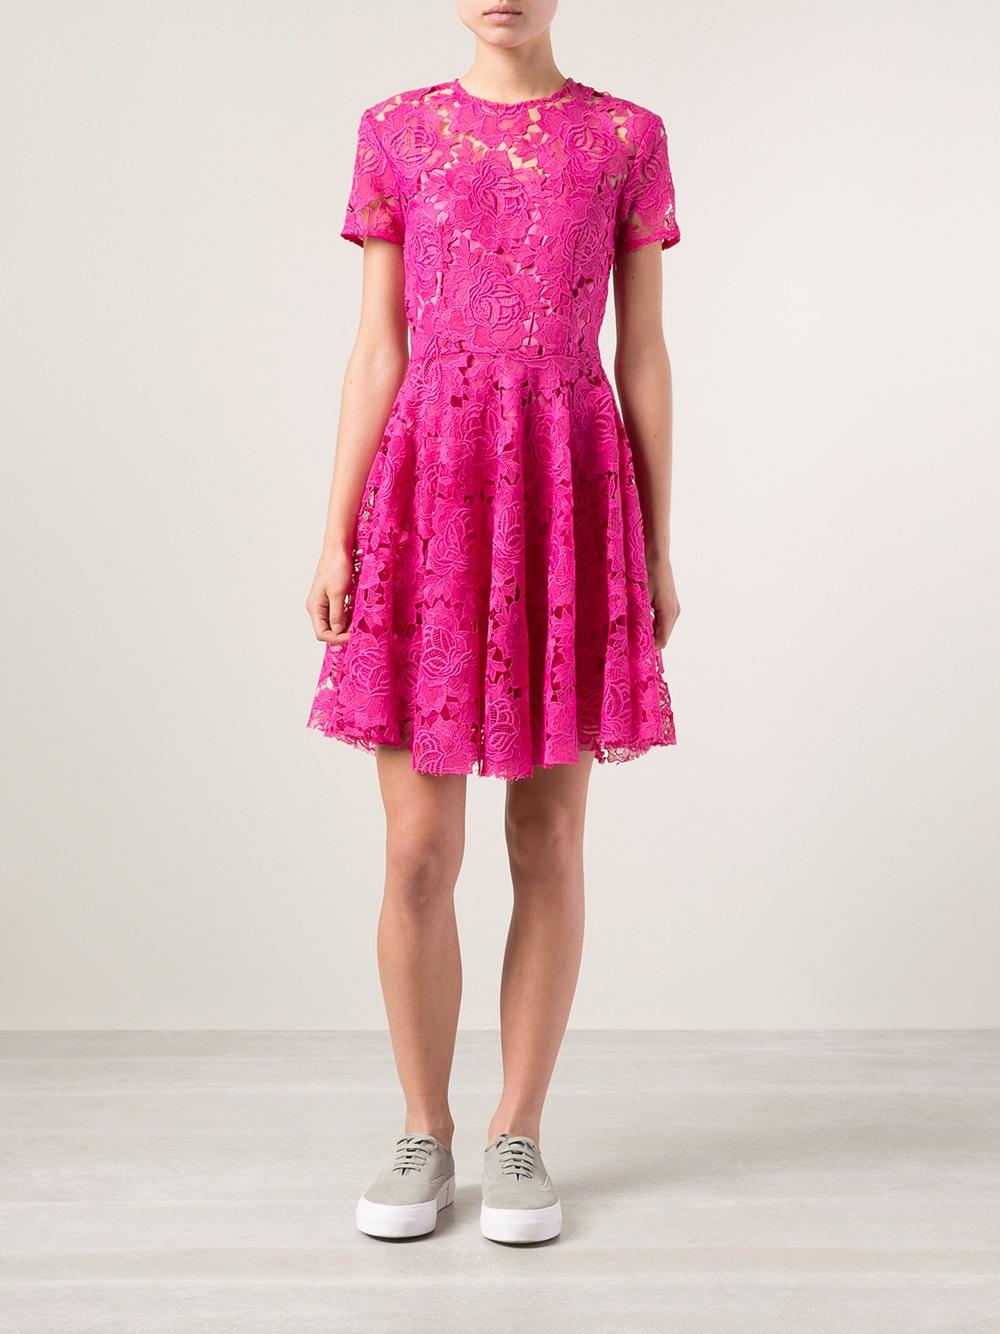 Bcbg Dress Floral